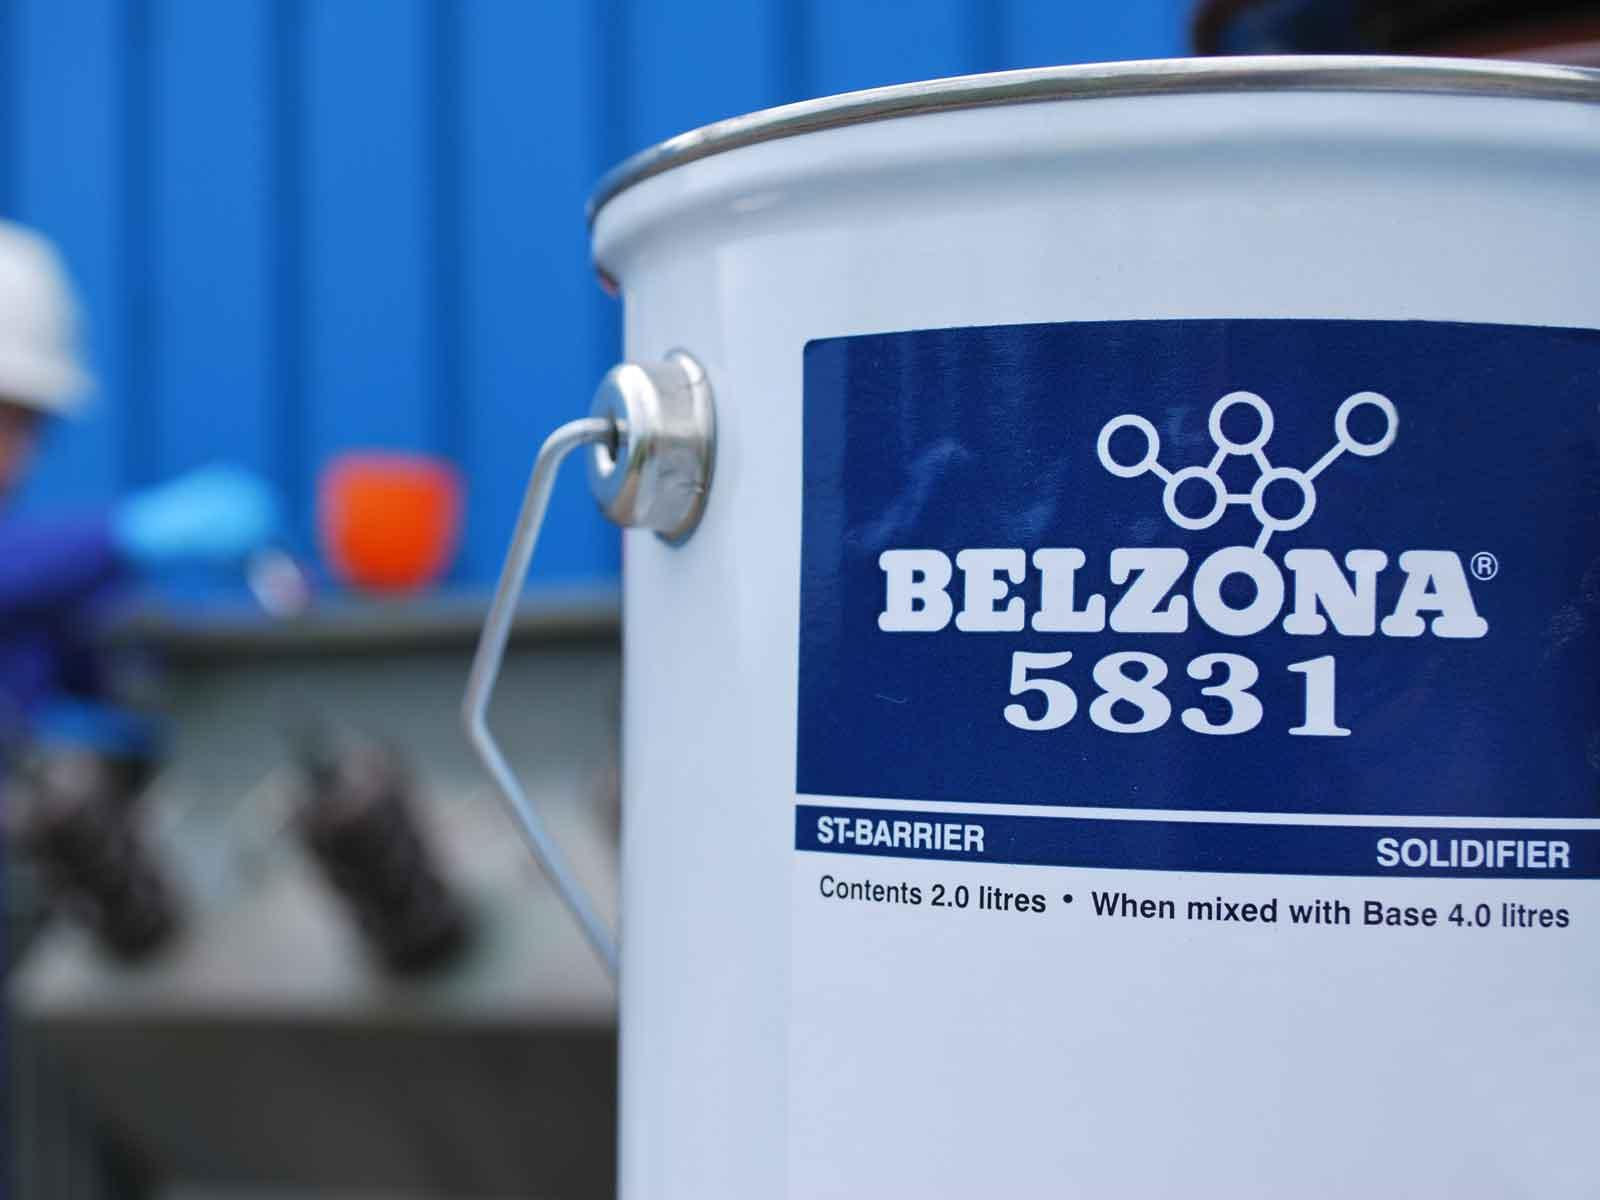 Belzona 5831 (ST-Barrier) epoxy zaštitni premaz tolerantan na vlažne površine